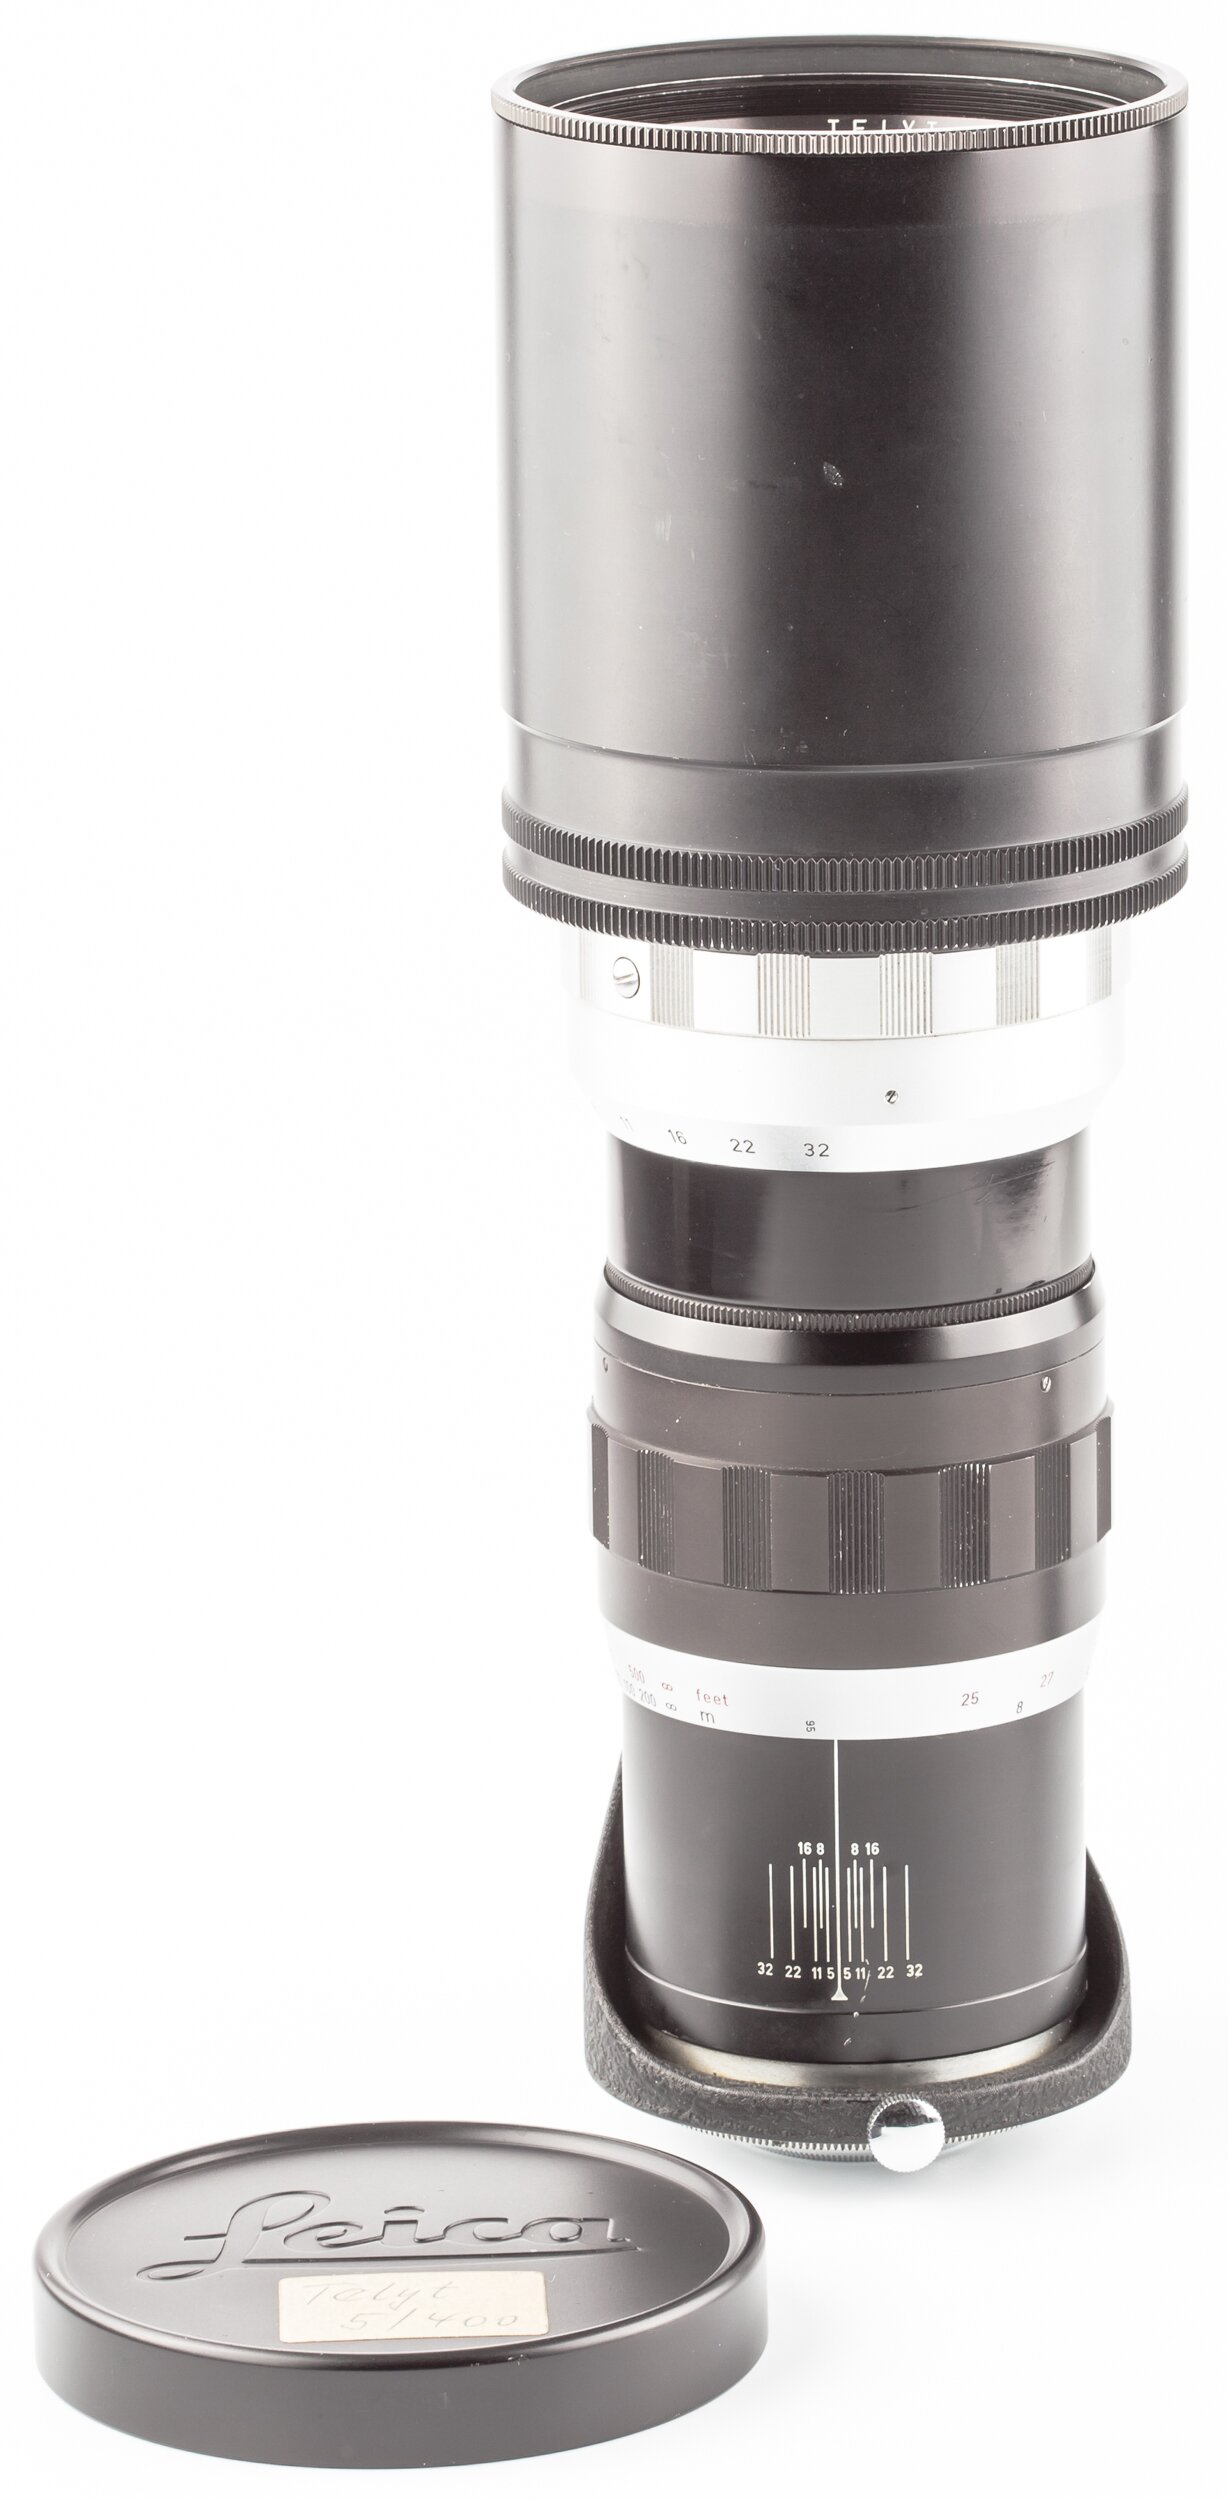 Leica Telyt 1:5/400mm II Visoflex TLCOO 11756